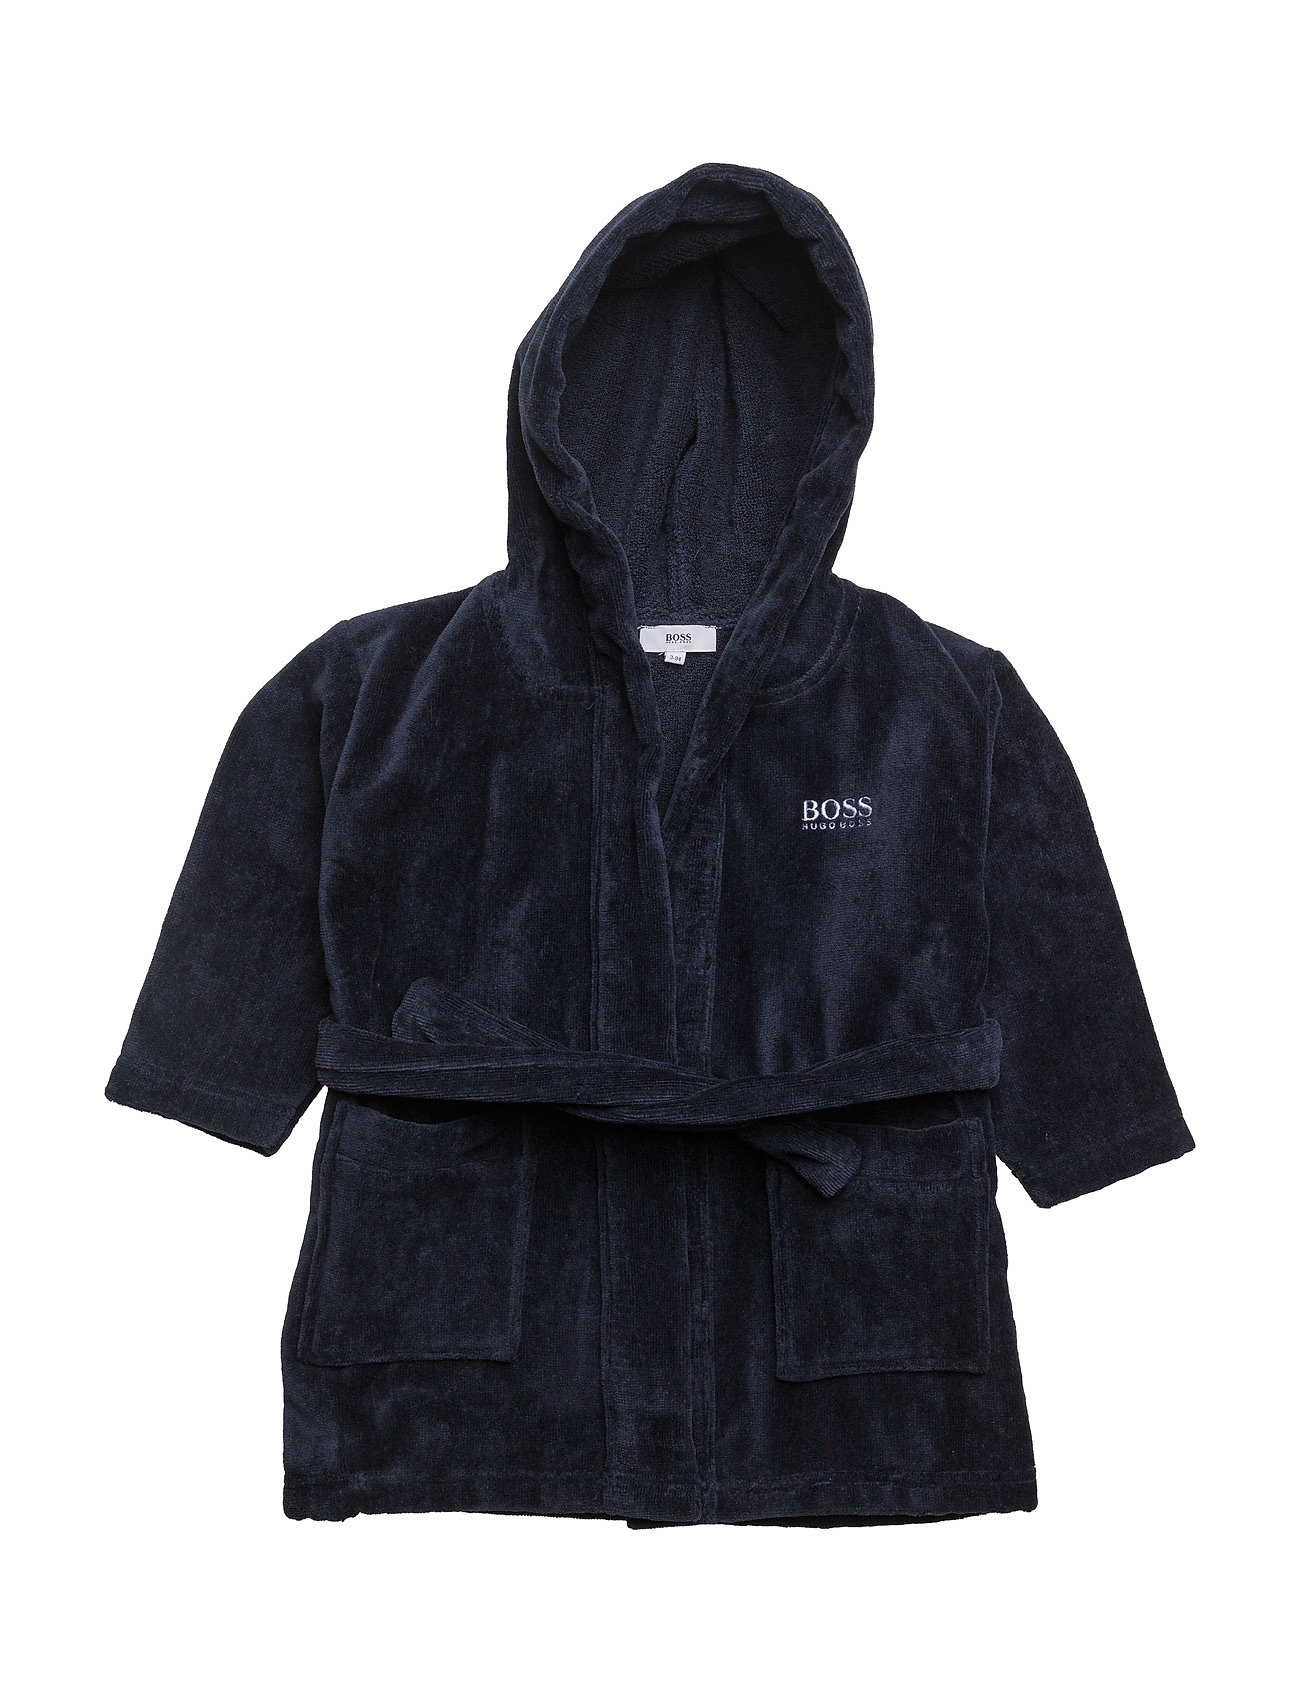 Bathrobe BOSS Håndklæder & Badekåber til Børn i Navy blå